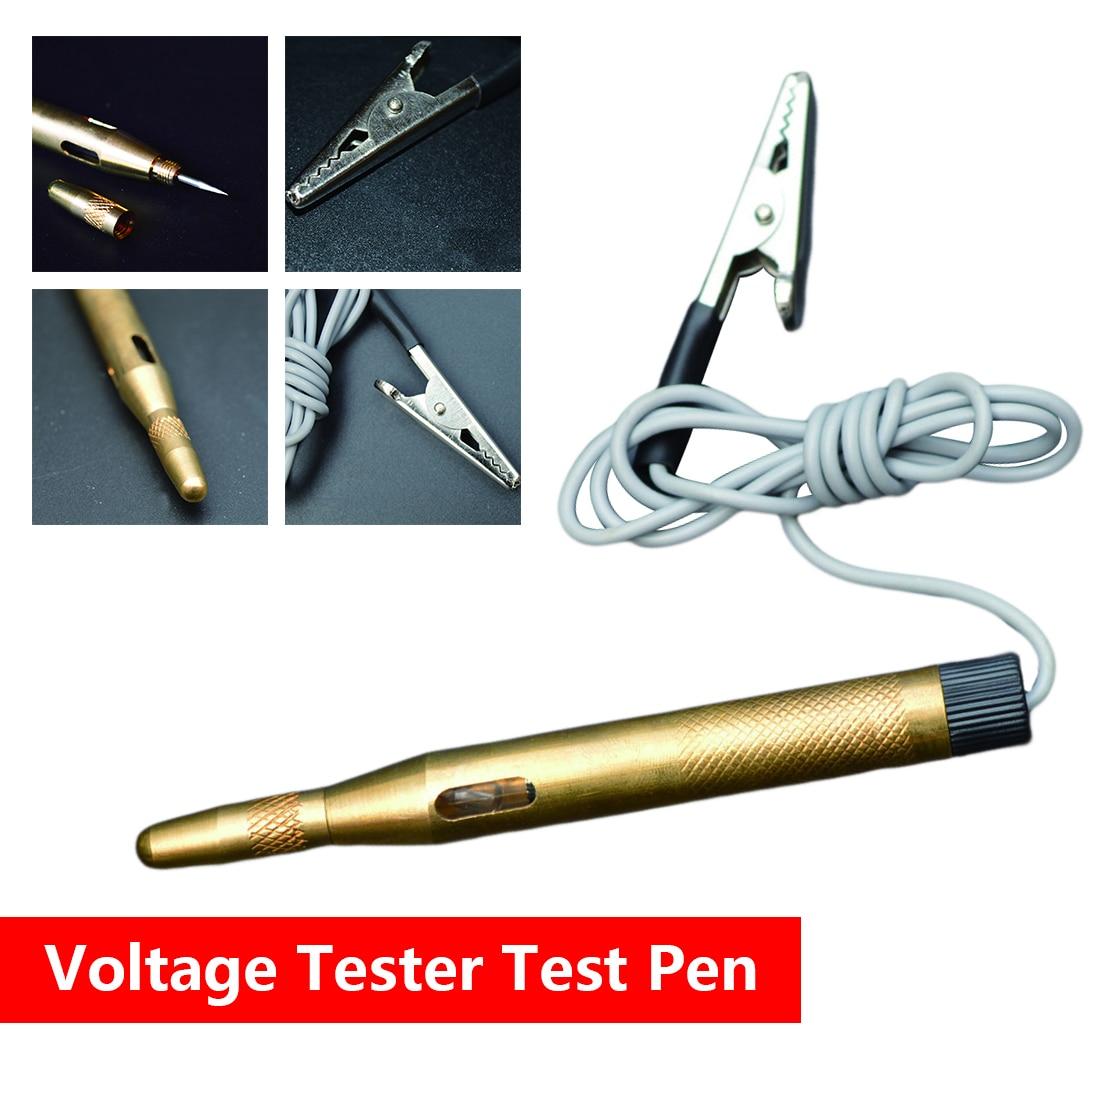 New DC 6-24V Auto Car Light Circuit Tester Lamp Voltage Test Pen Detector Probe